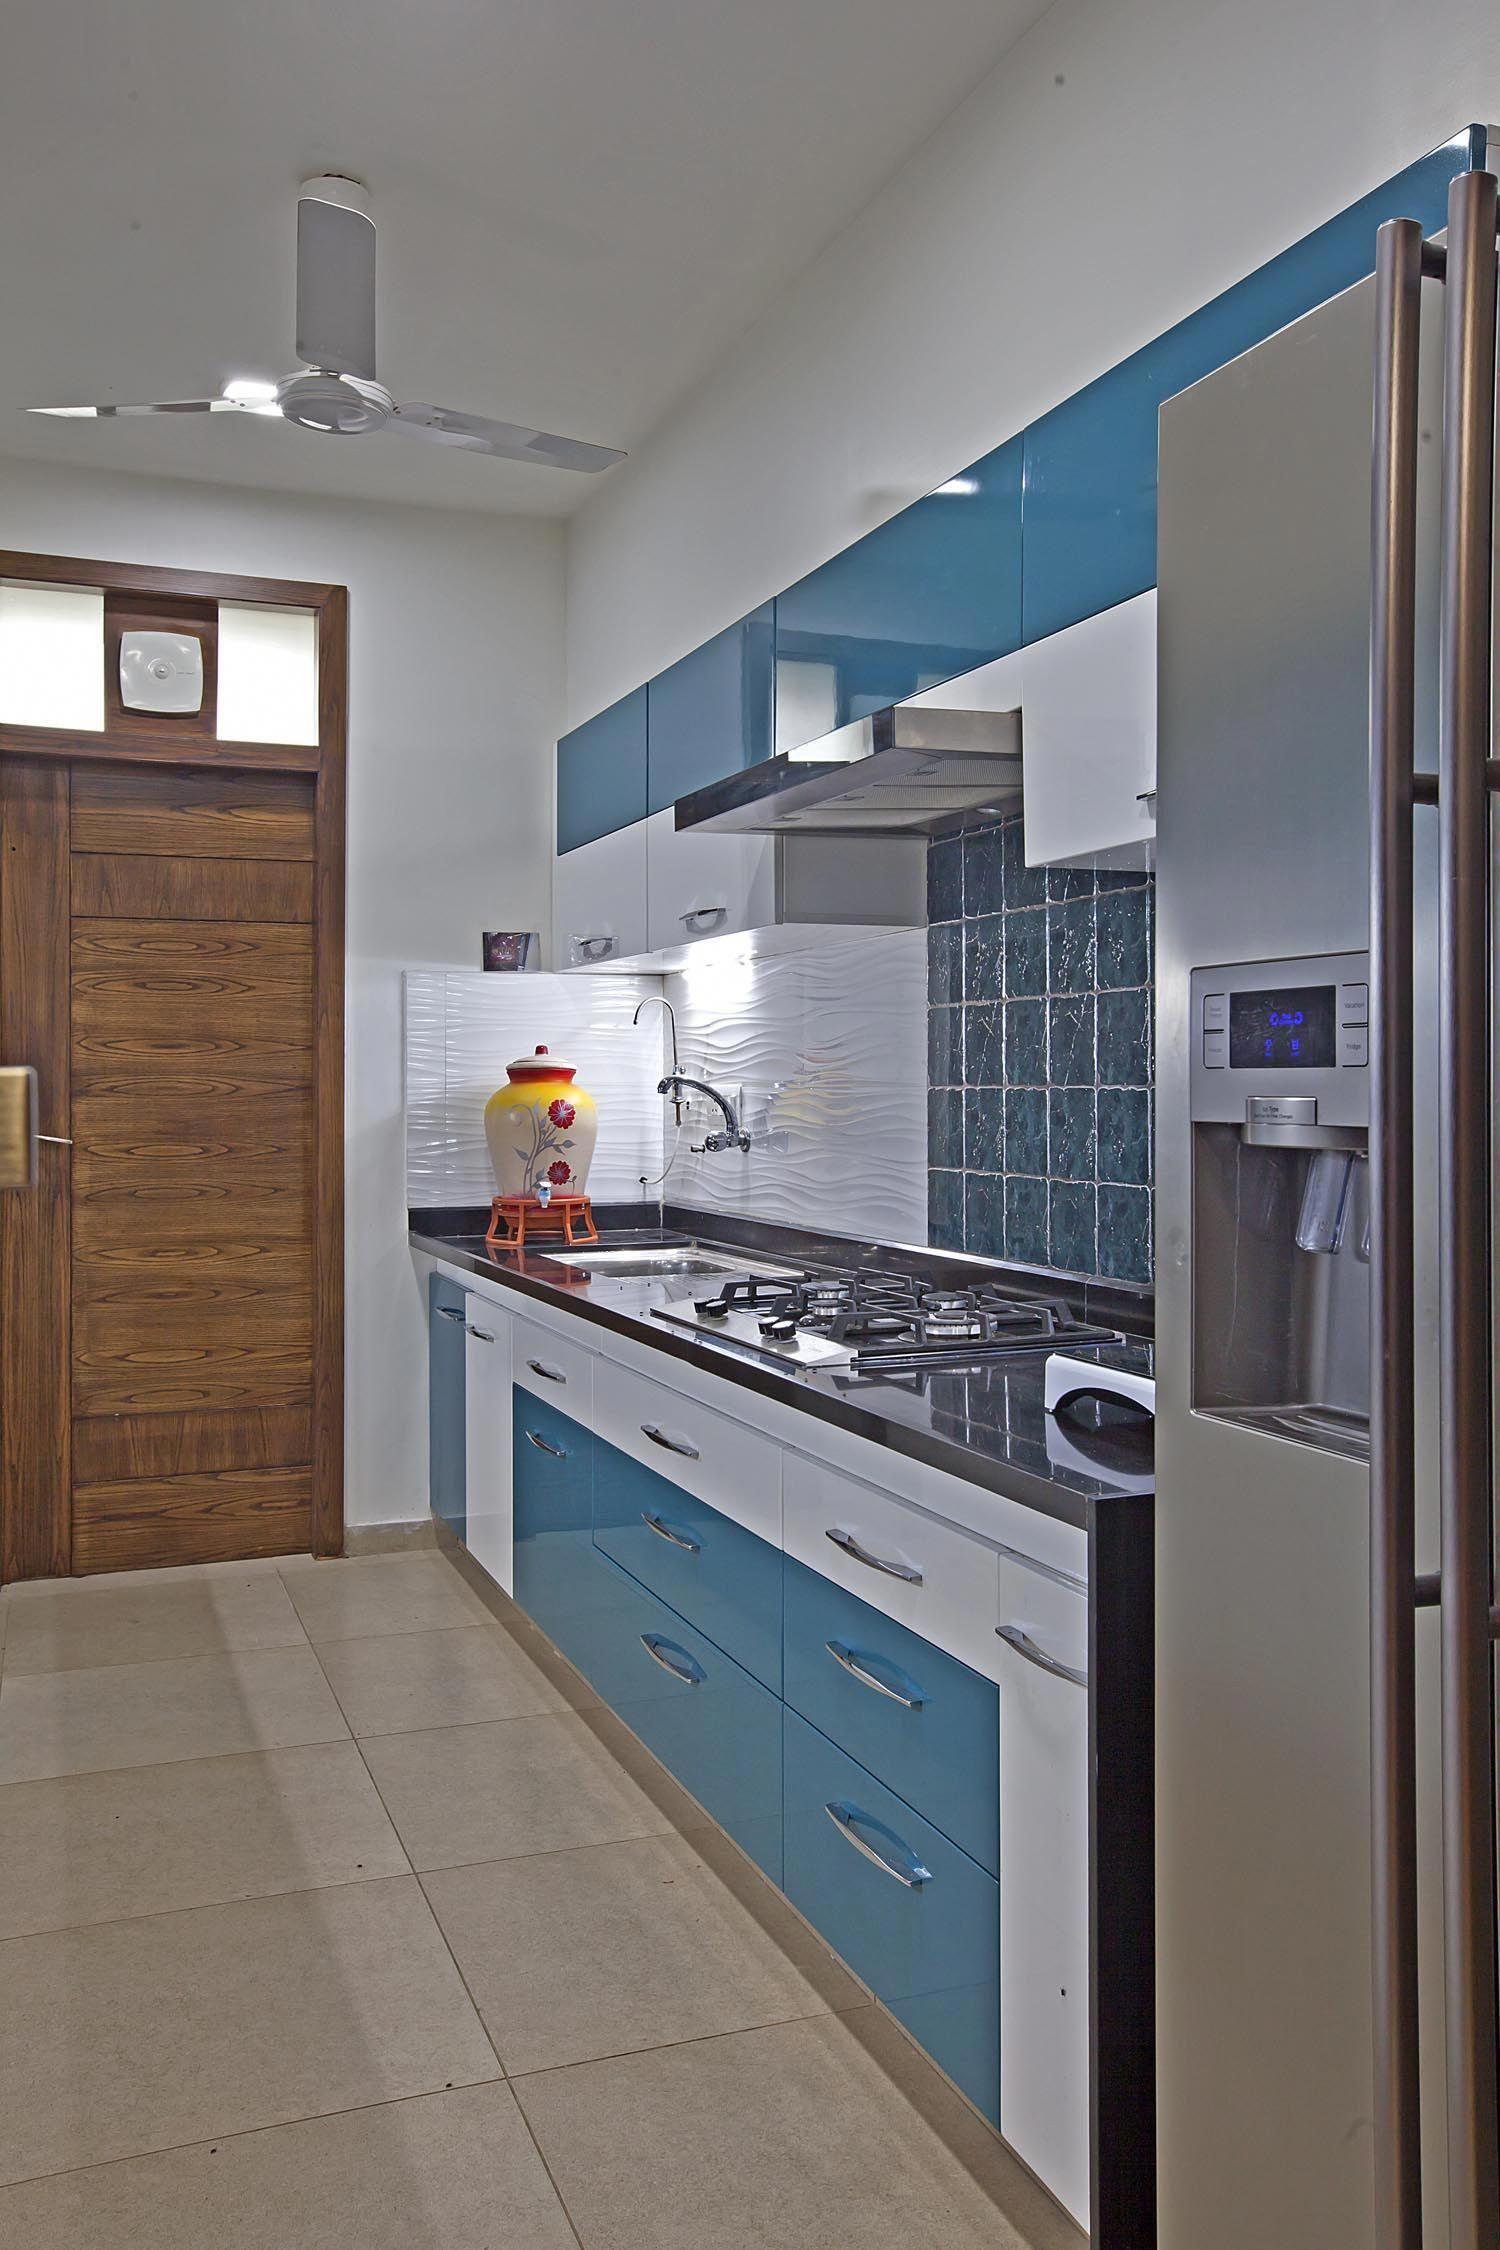 More Ideas Below Kitchenremodel Kitchenideas Indian Modular Kitchen Ideas Small Modula Modular Kitchen Cabinets Interior Design Kitchen Kitchen Design Small